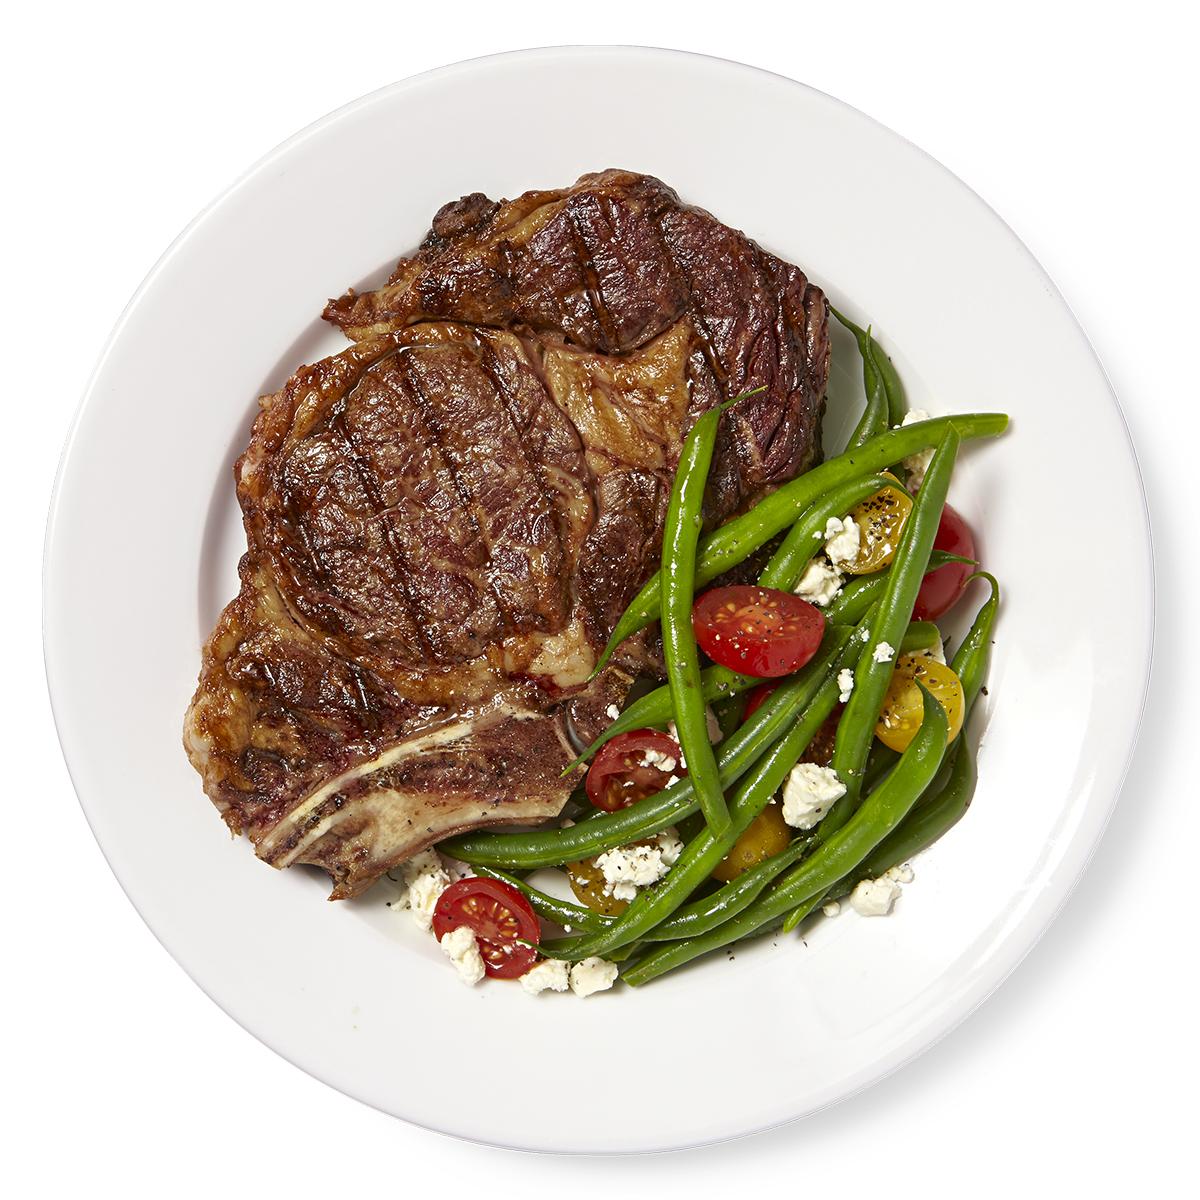 Greek Steak & Green Bean Salad